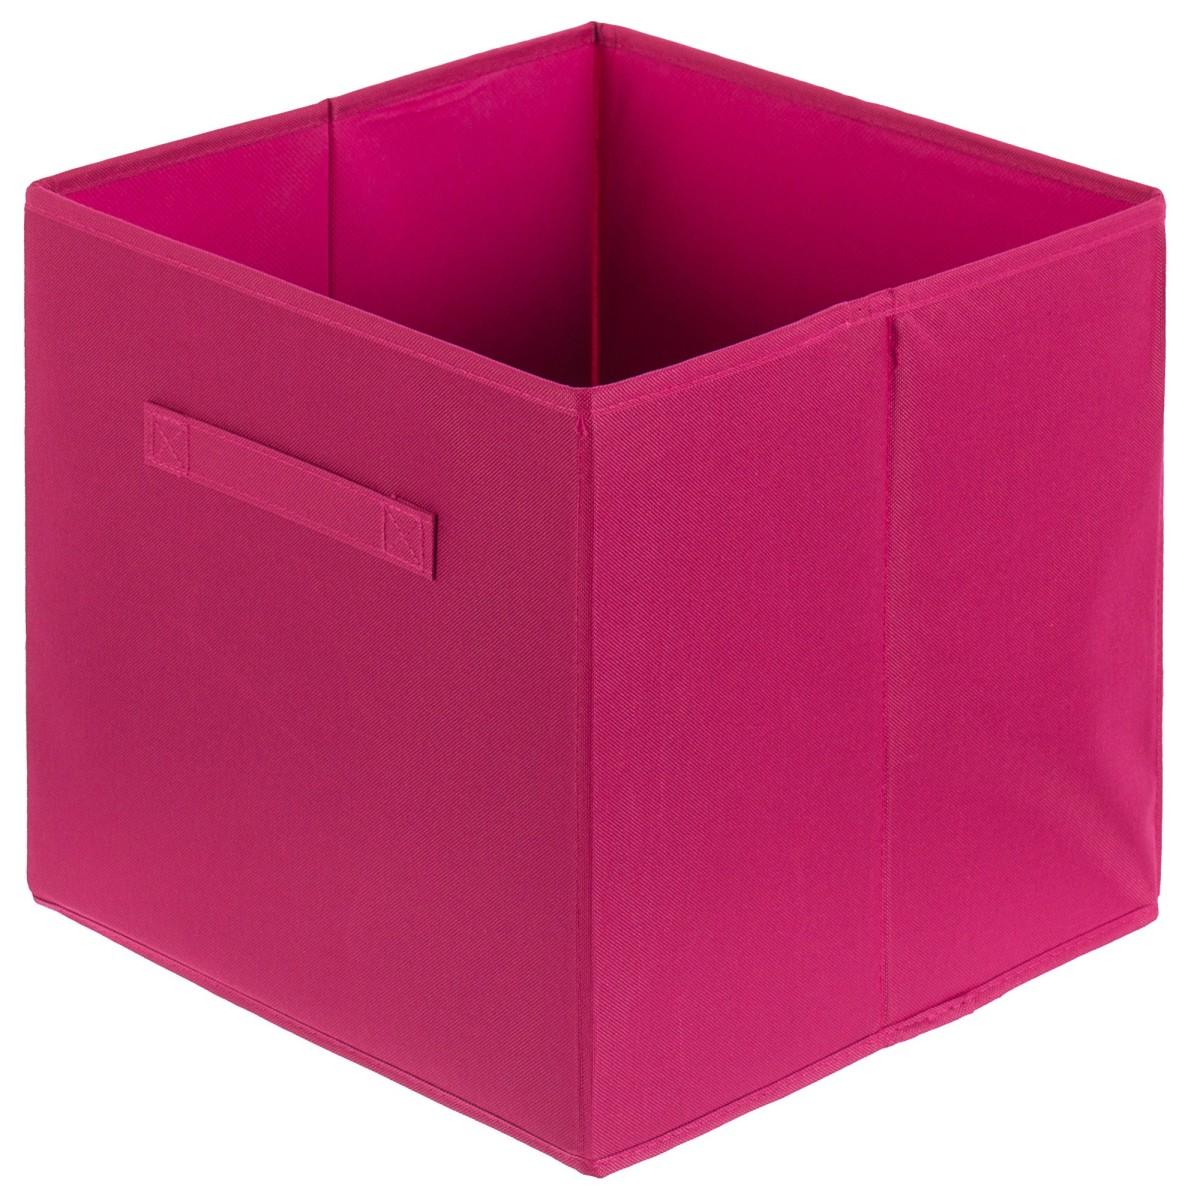 Короб Spaceo 310x310x310 мм 29.8 л полиэстер цвет розовый